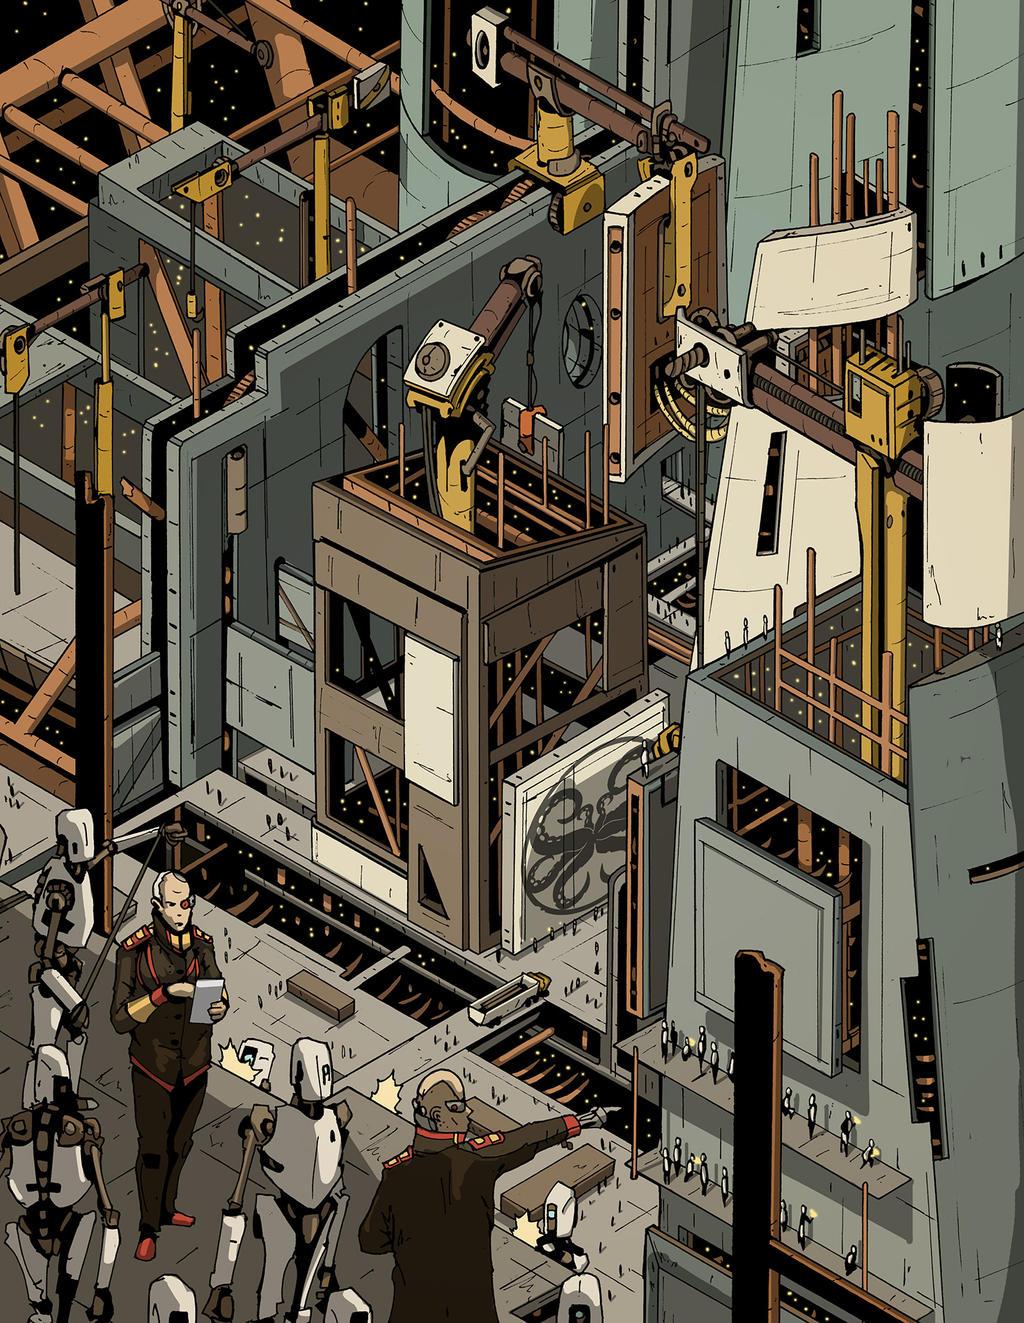 MYZ - Under Construction by DarkMechanic